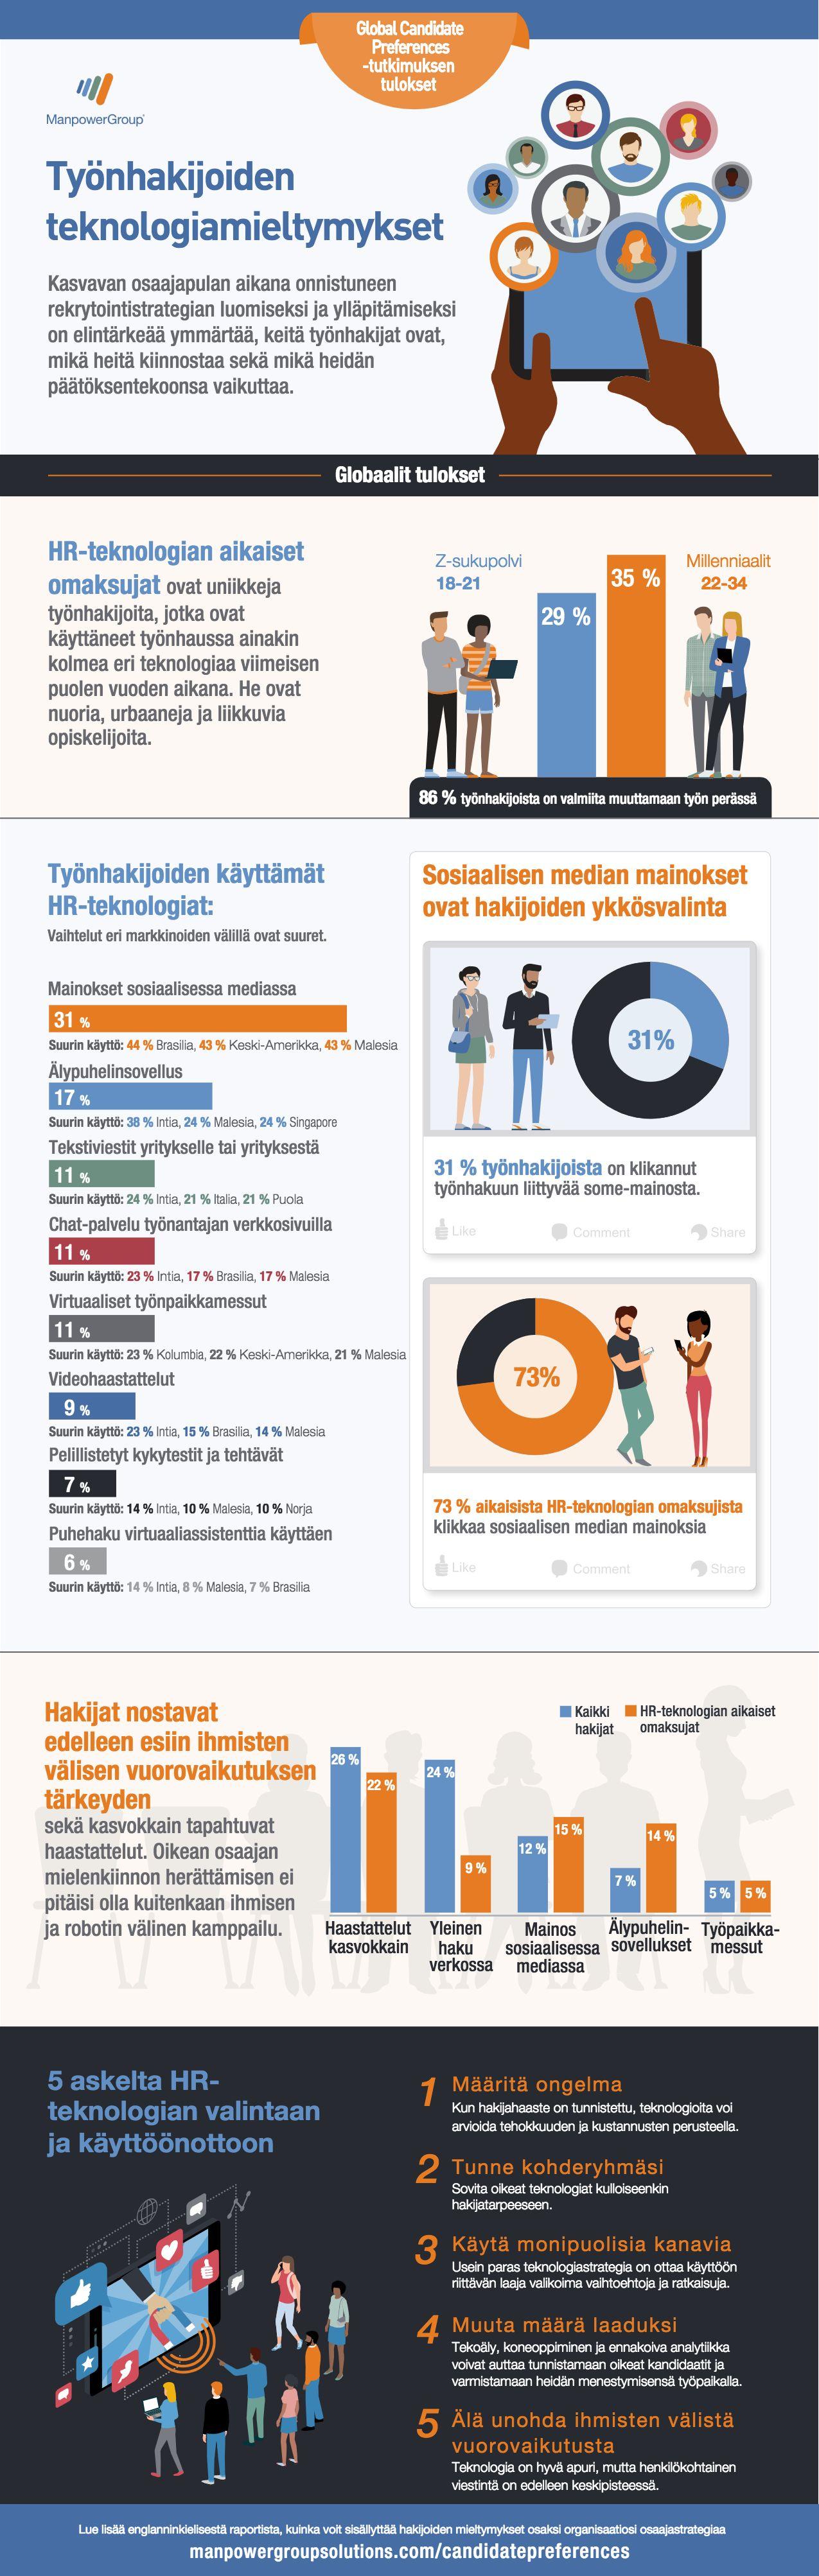 MGS_CP_Siri_Infographic-Screen_suomeksi_final-1